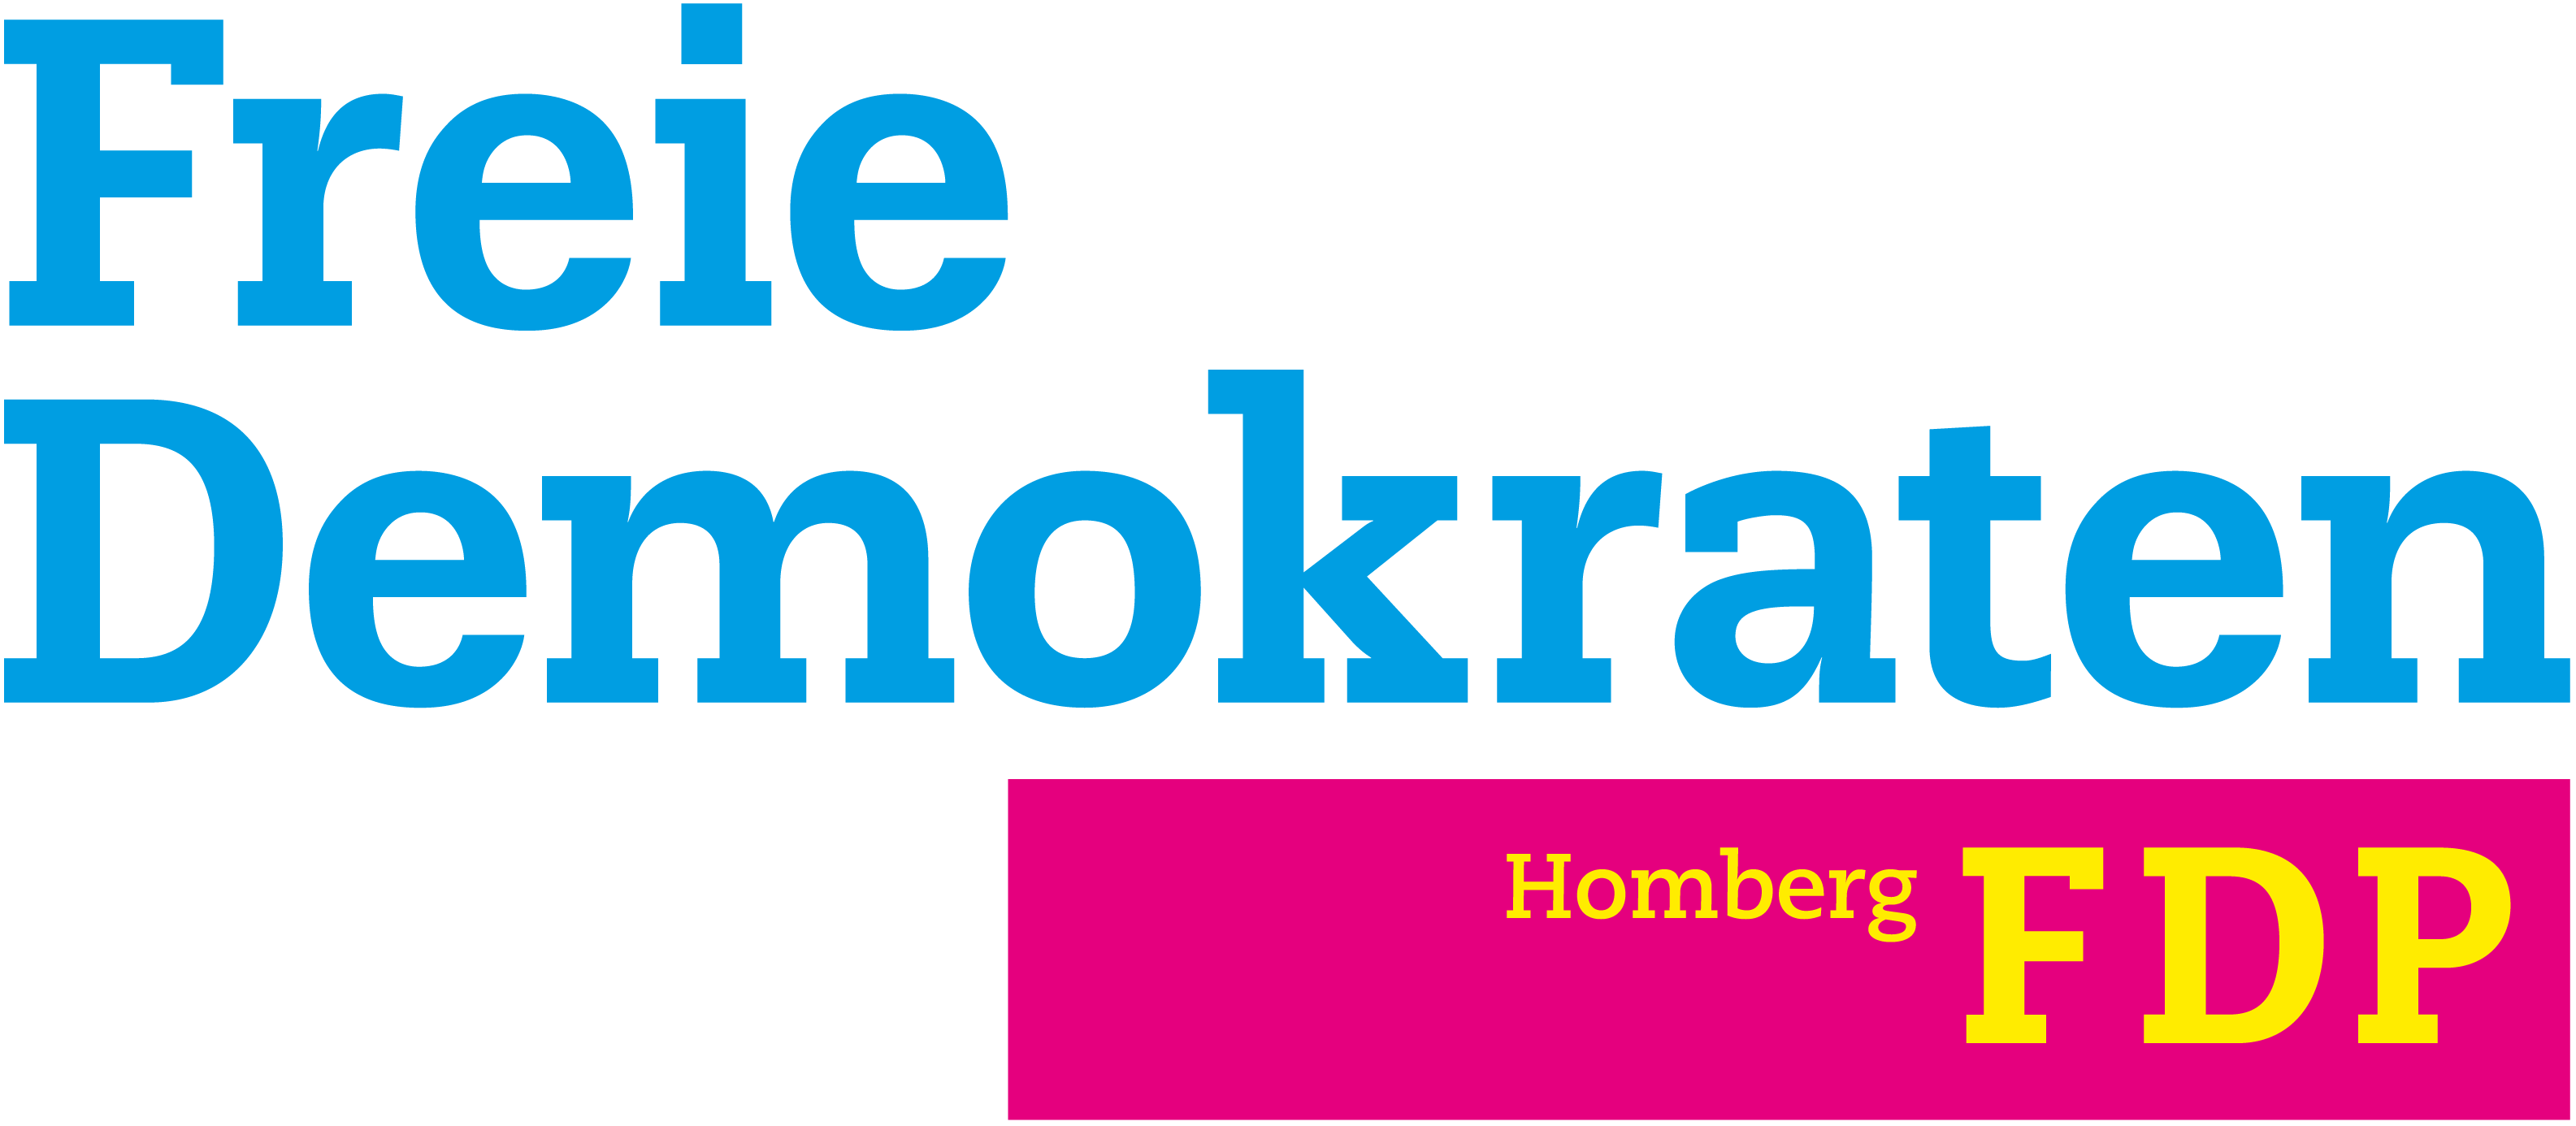 FDP-Stadtverband Homberg (Efze)